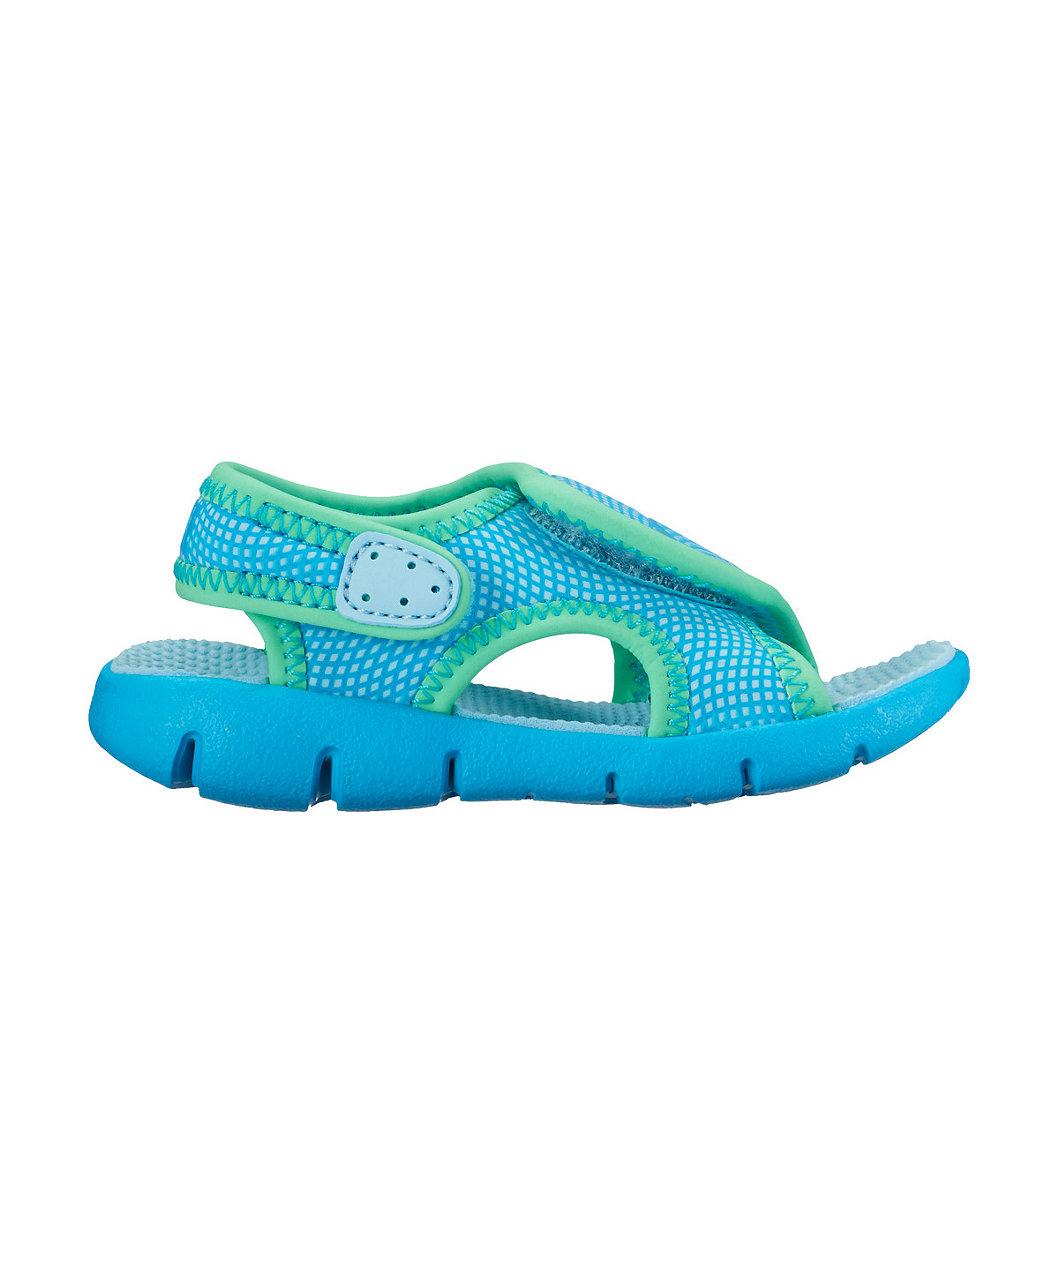 ab56f50504305f ... promo code nike sunray adjust 4 sandal blue toddler girls fc3b8 1e7c8